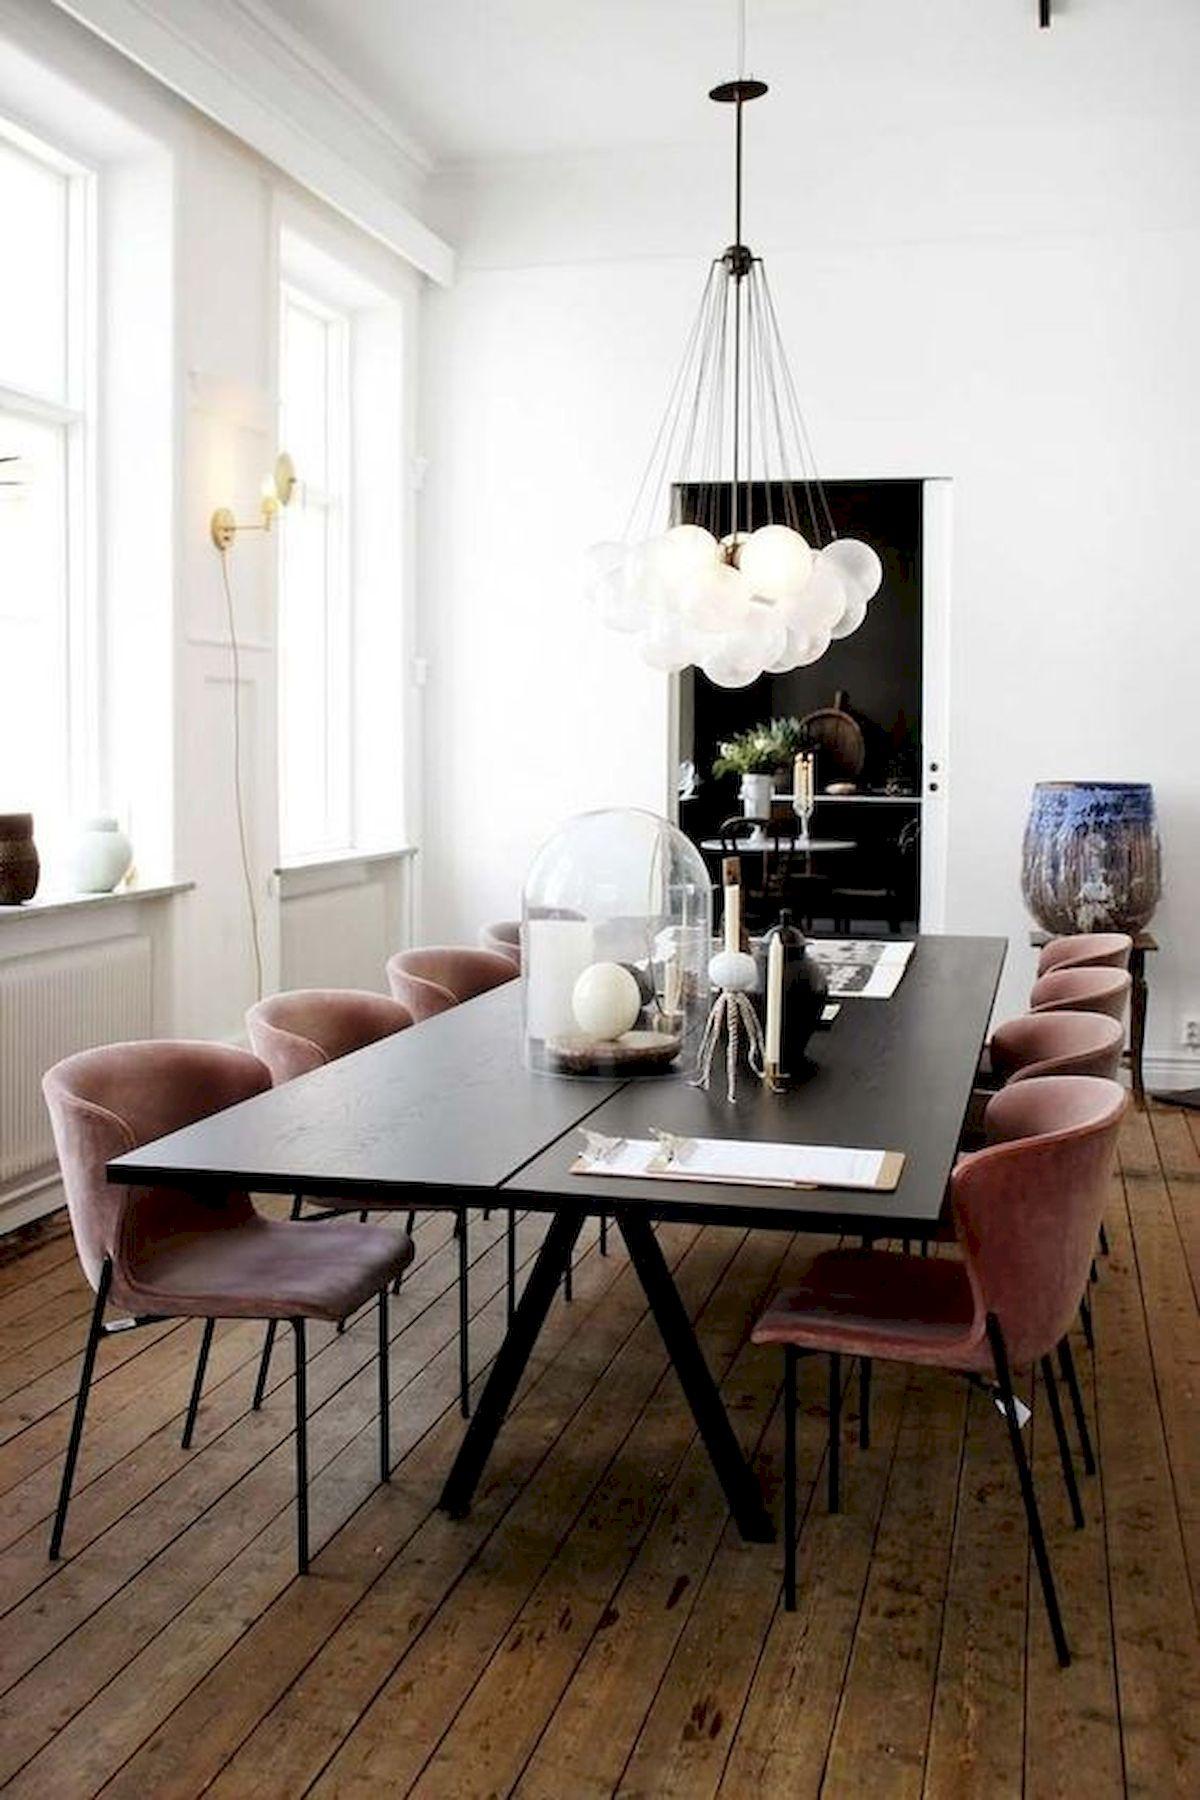 80 Elegant Modern Dining Room Design And Decor Ideas (62)